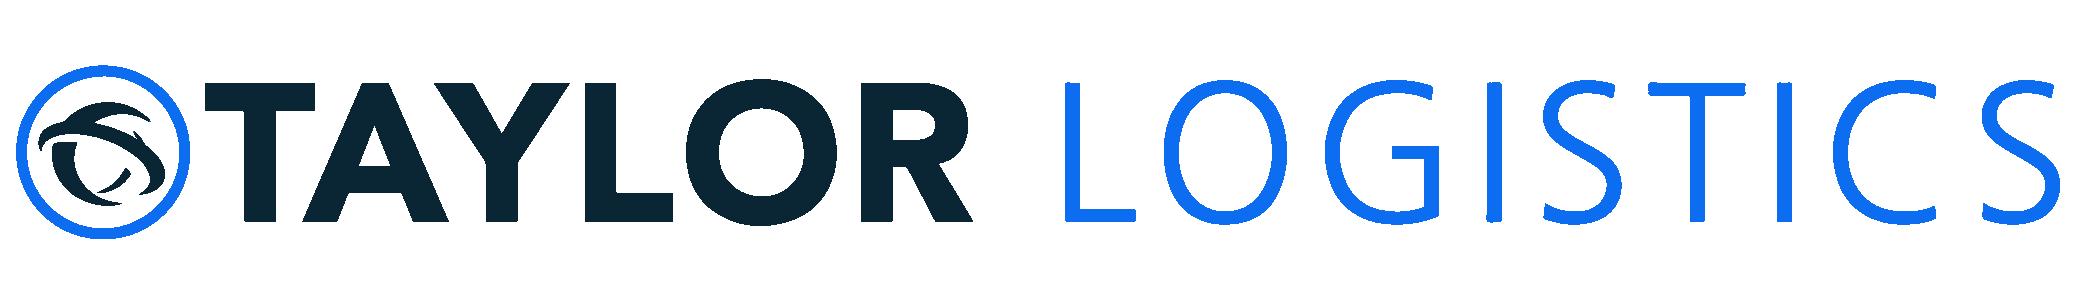 Taylor Logistics Newsletter Logo-01